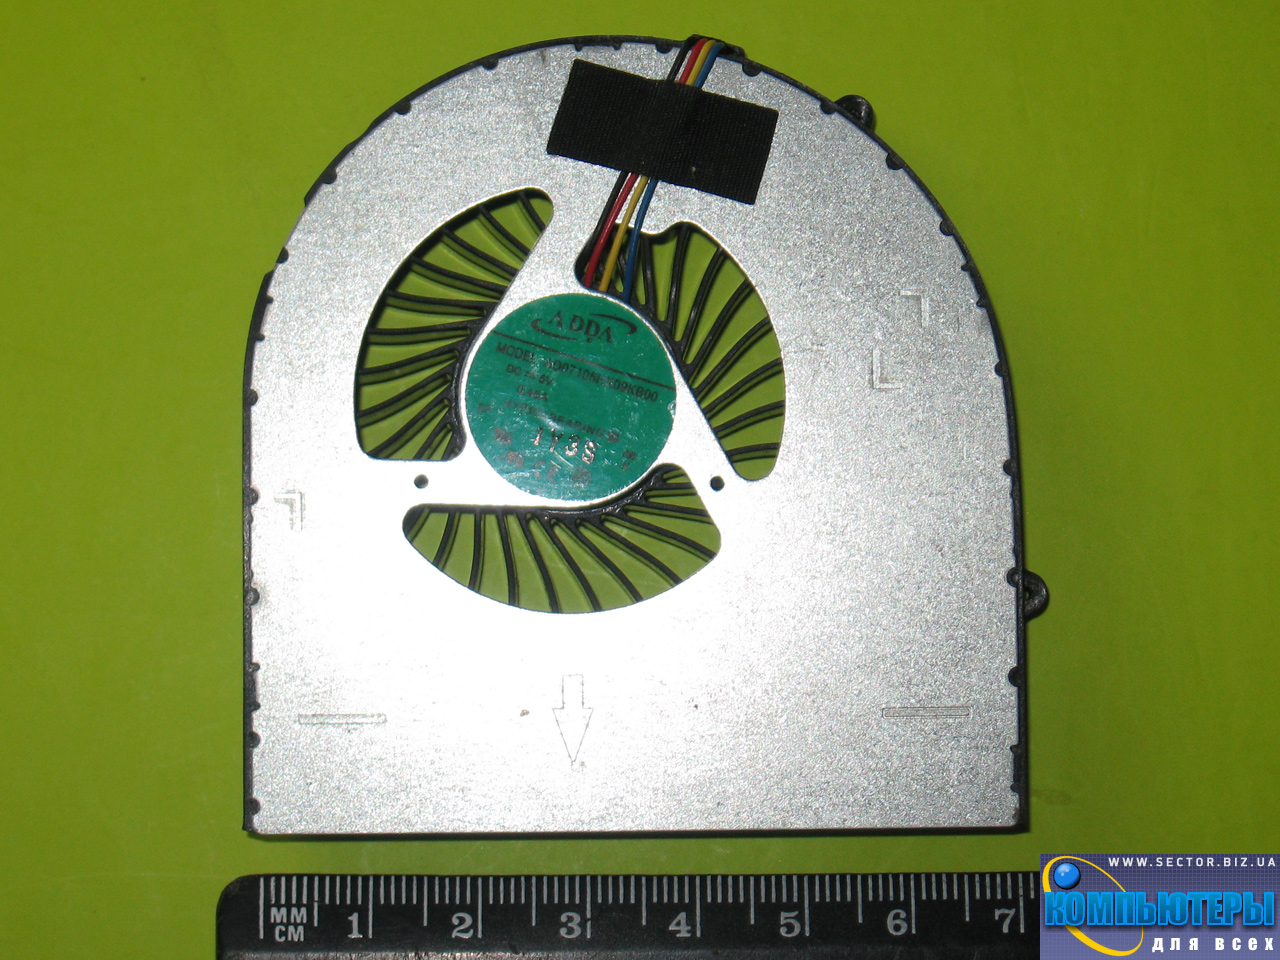 Кулер к ноутбуку Lenovo B570 V570 V570A Z570 p/n: AD0705HX09KB00. Фото № 4.